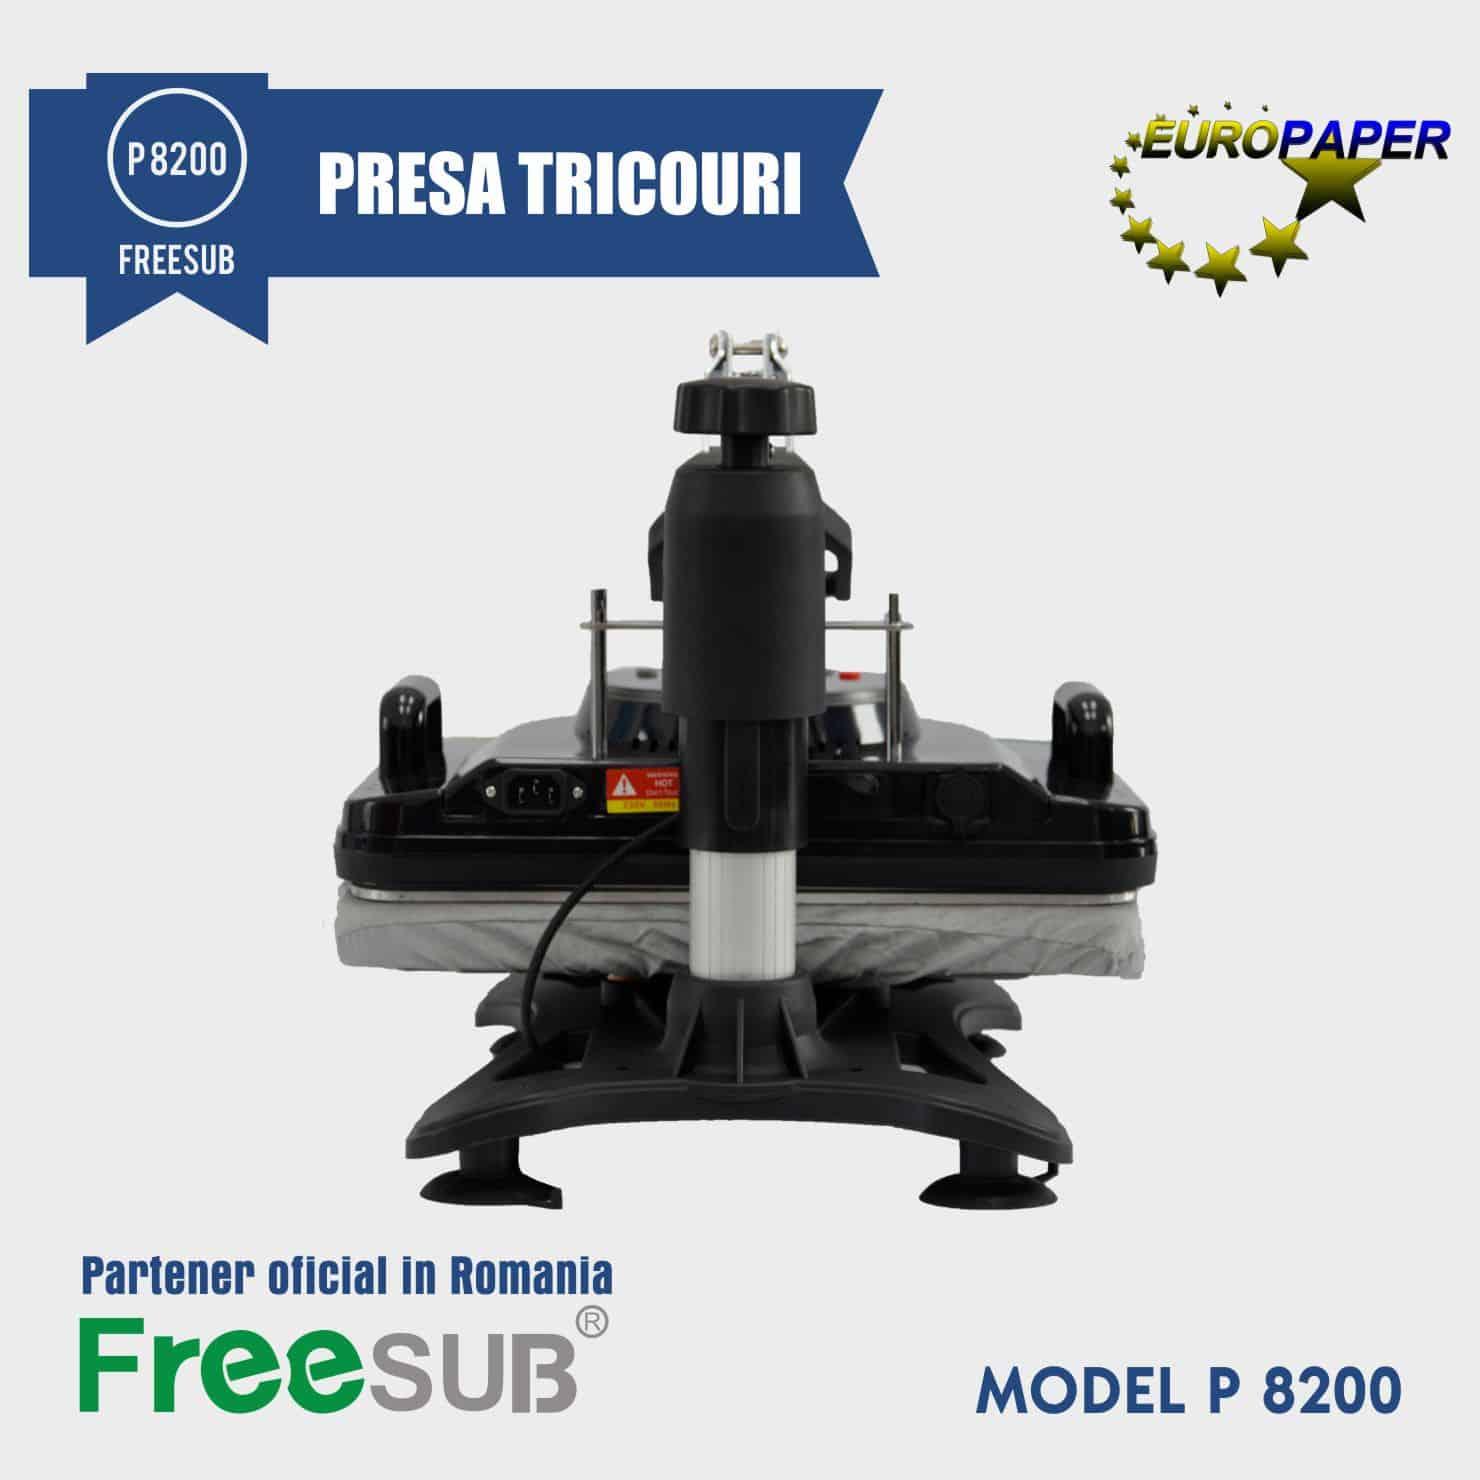 p 8200 freesub tricouri